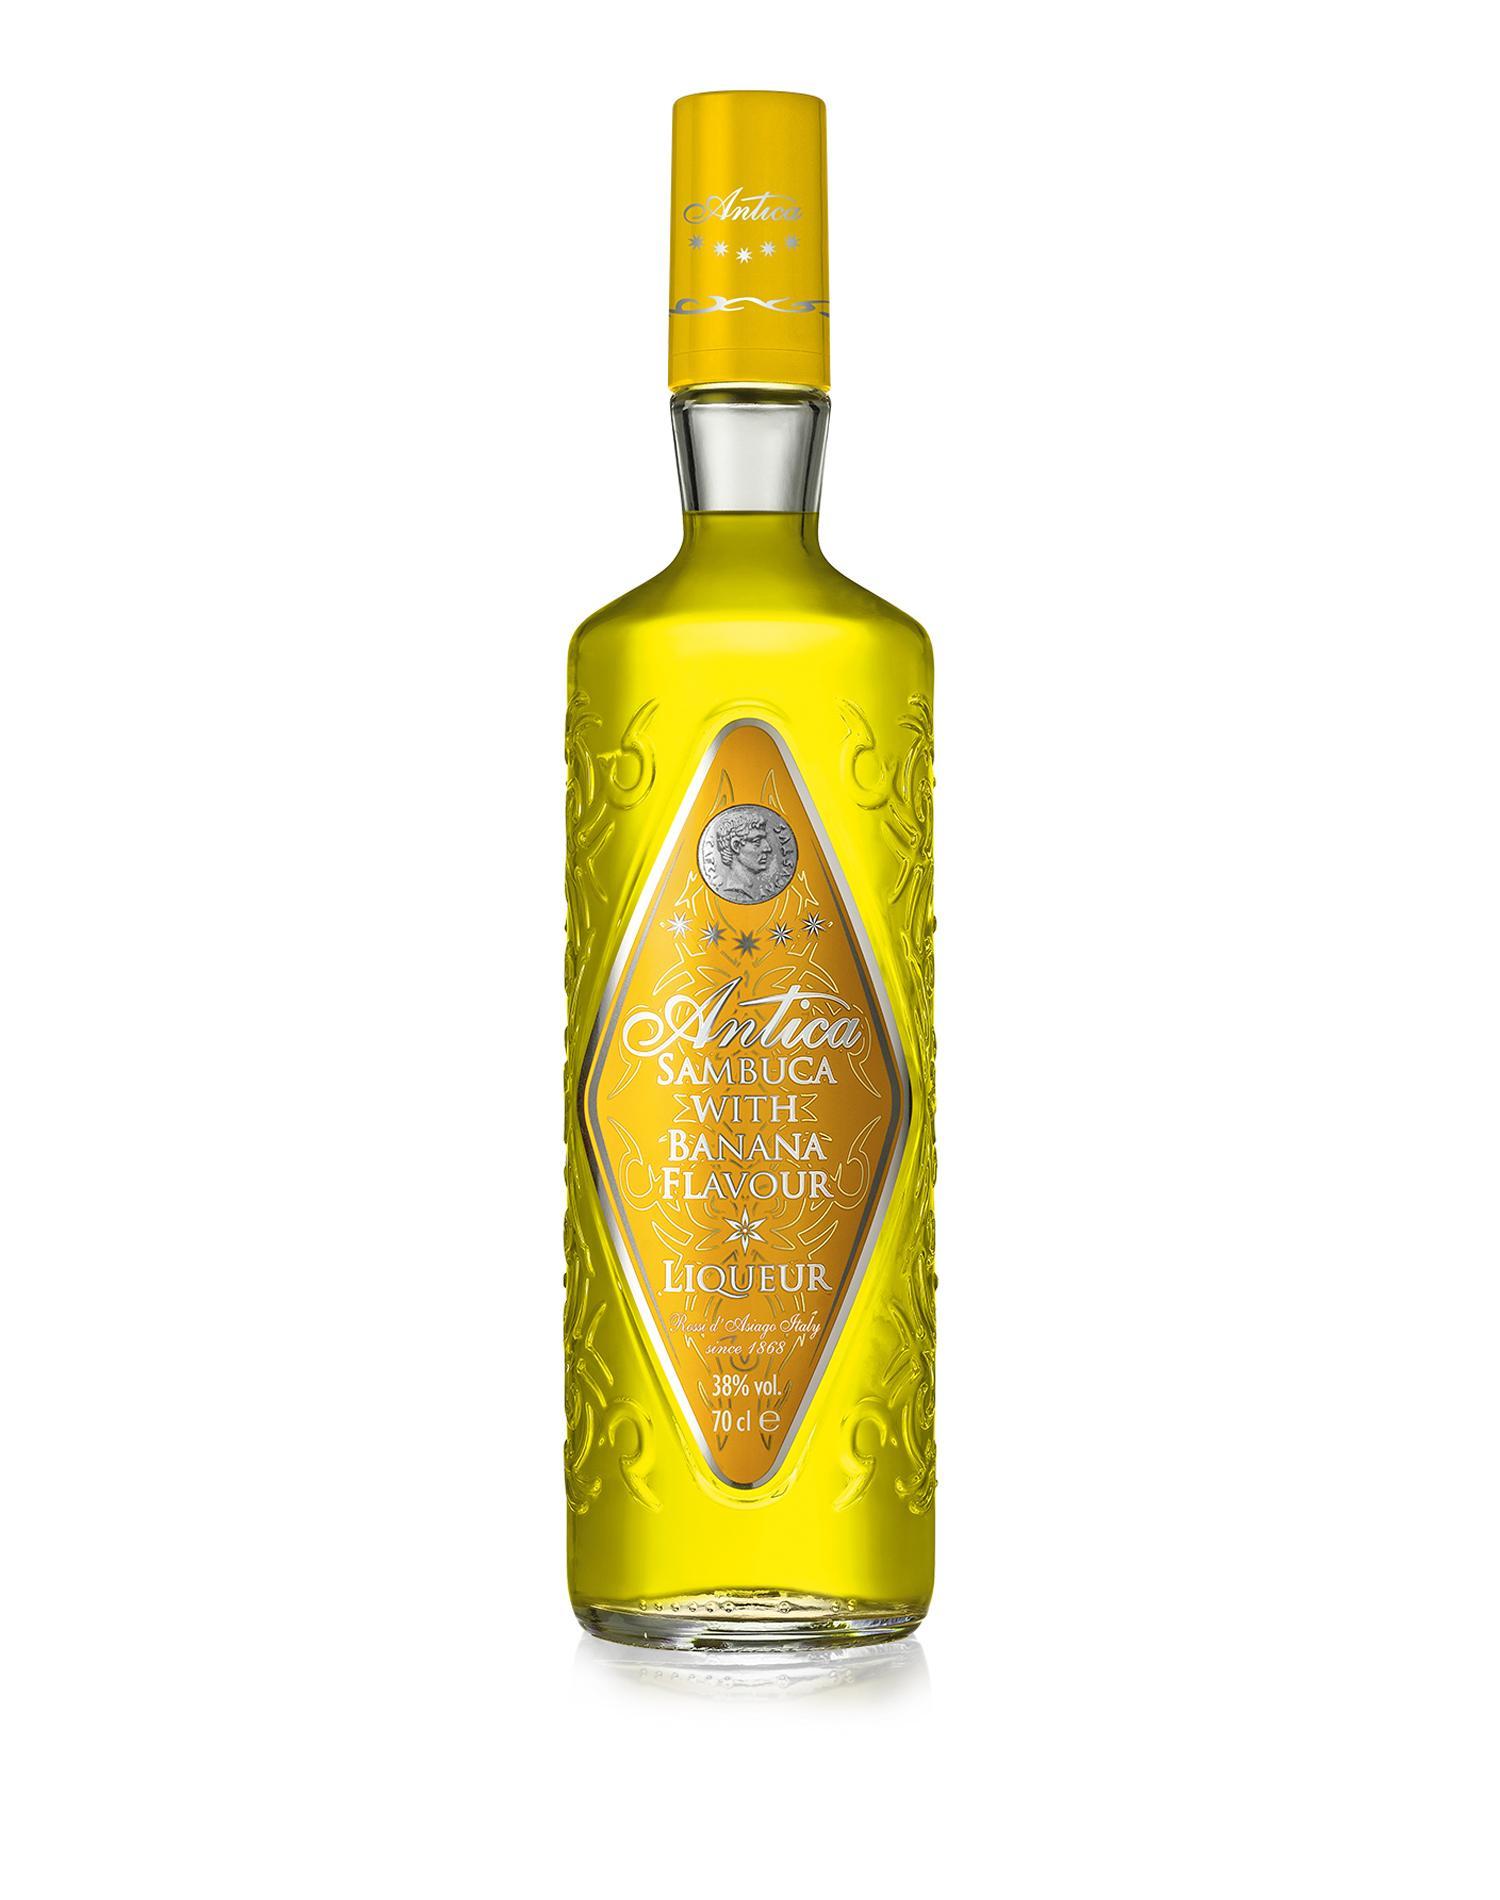 Image of Antica Sambuca con Banana - Liquore